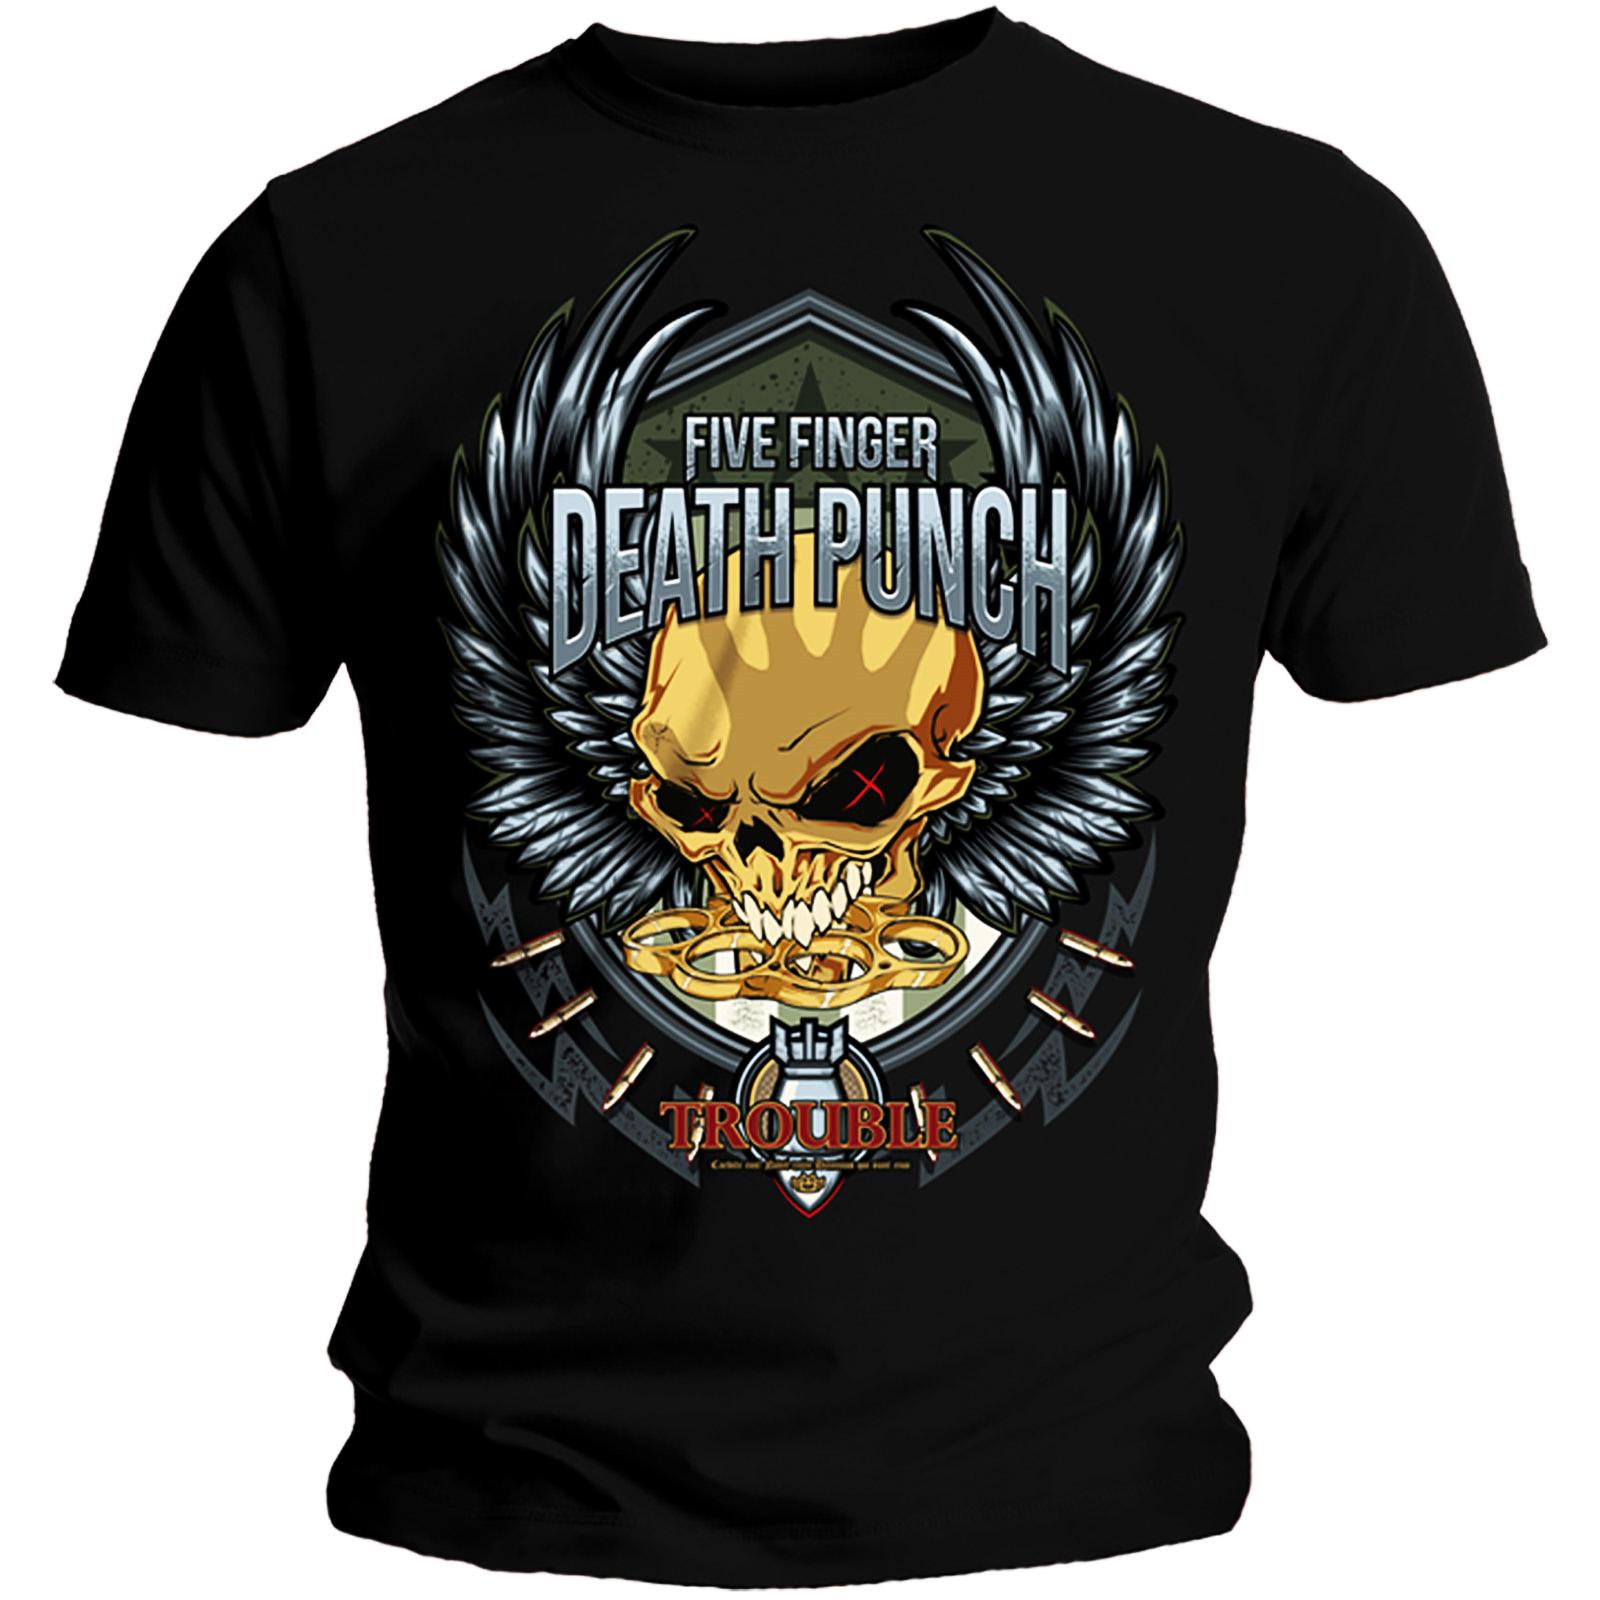 Official-T-Shirt-Five-Finger-Death-Punch-TROUBLE-Decade-of-Destruction-All-Sizes thumbnail 3